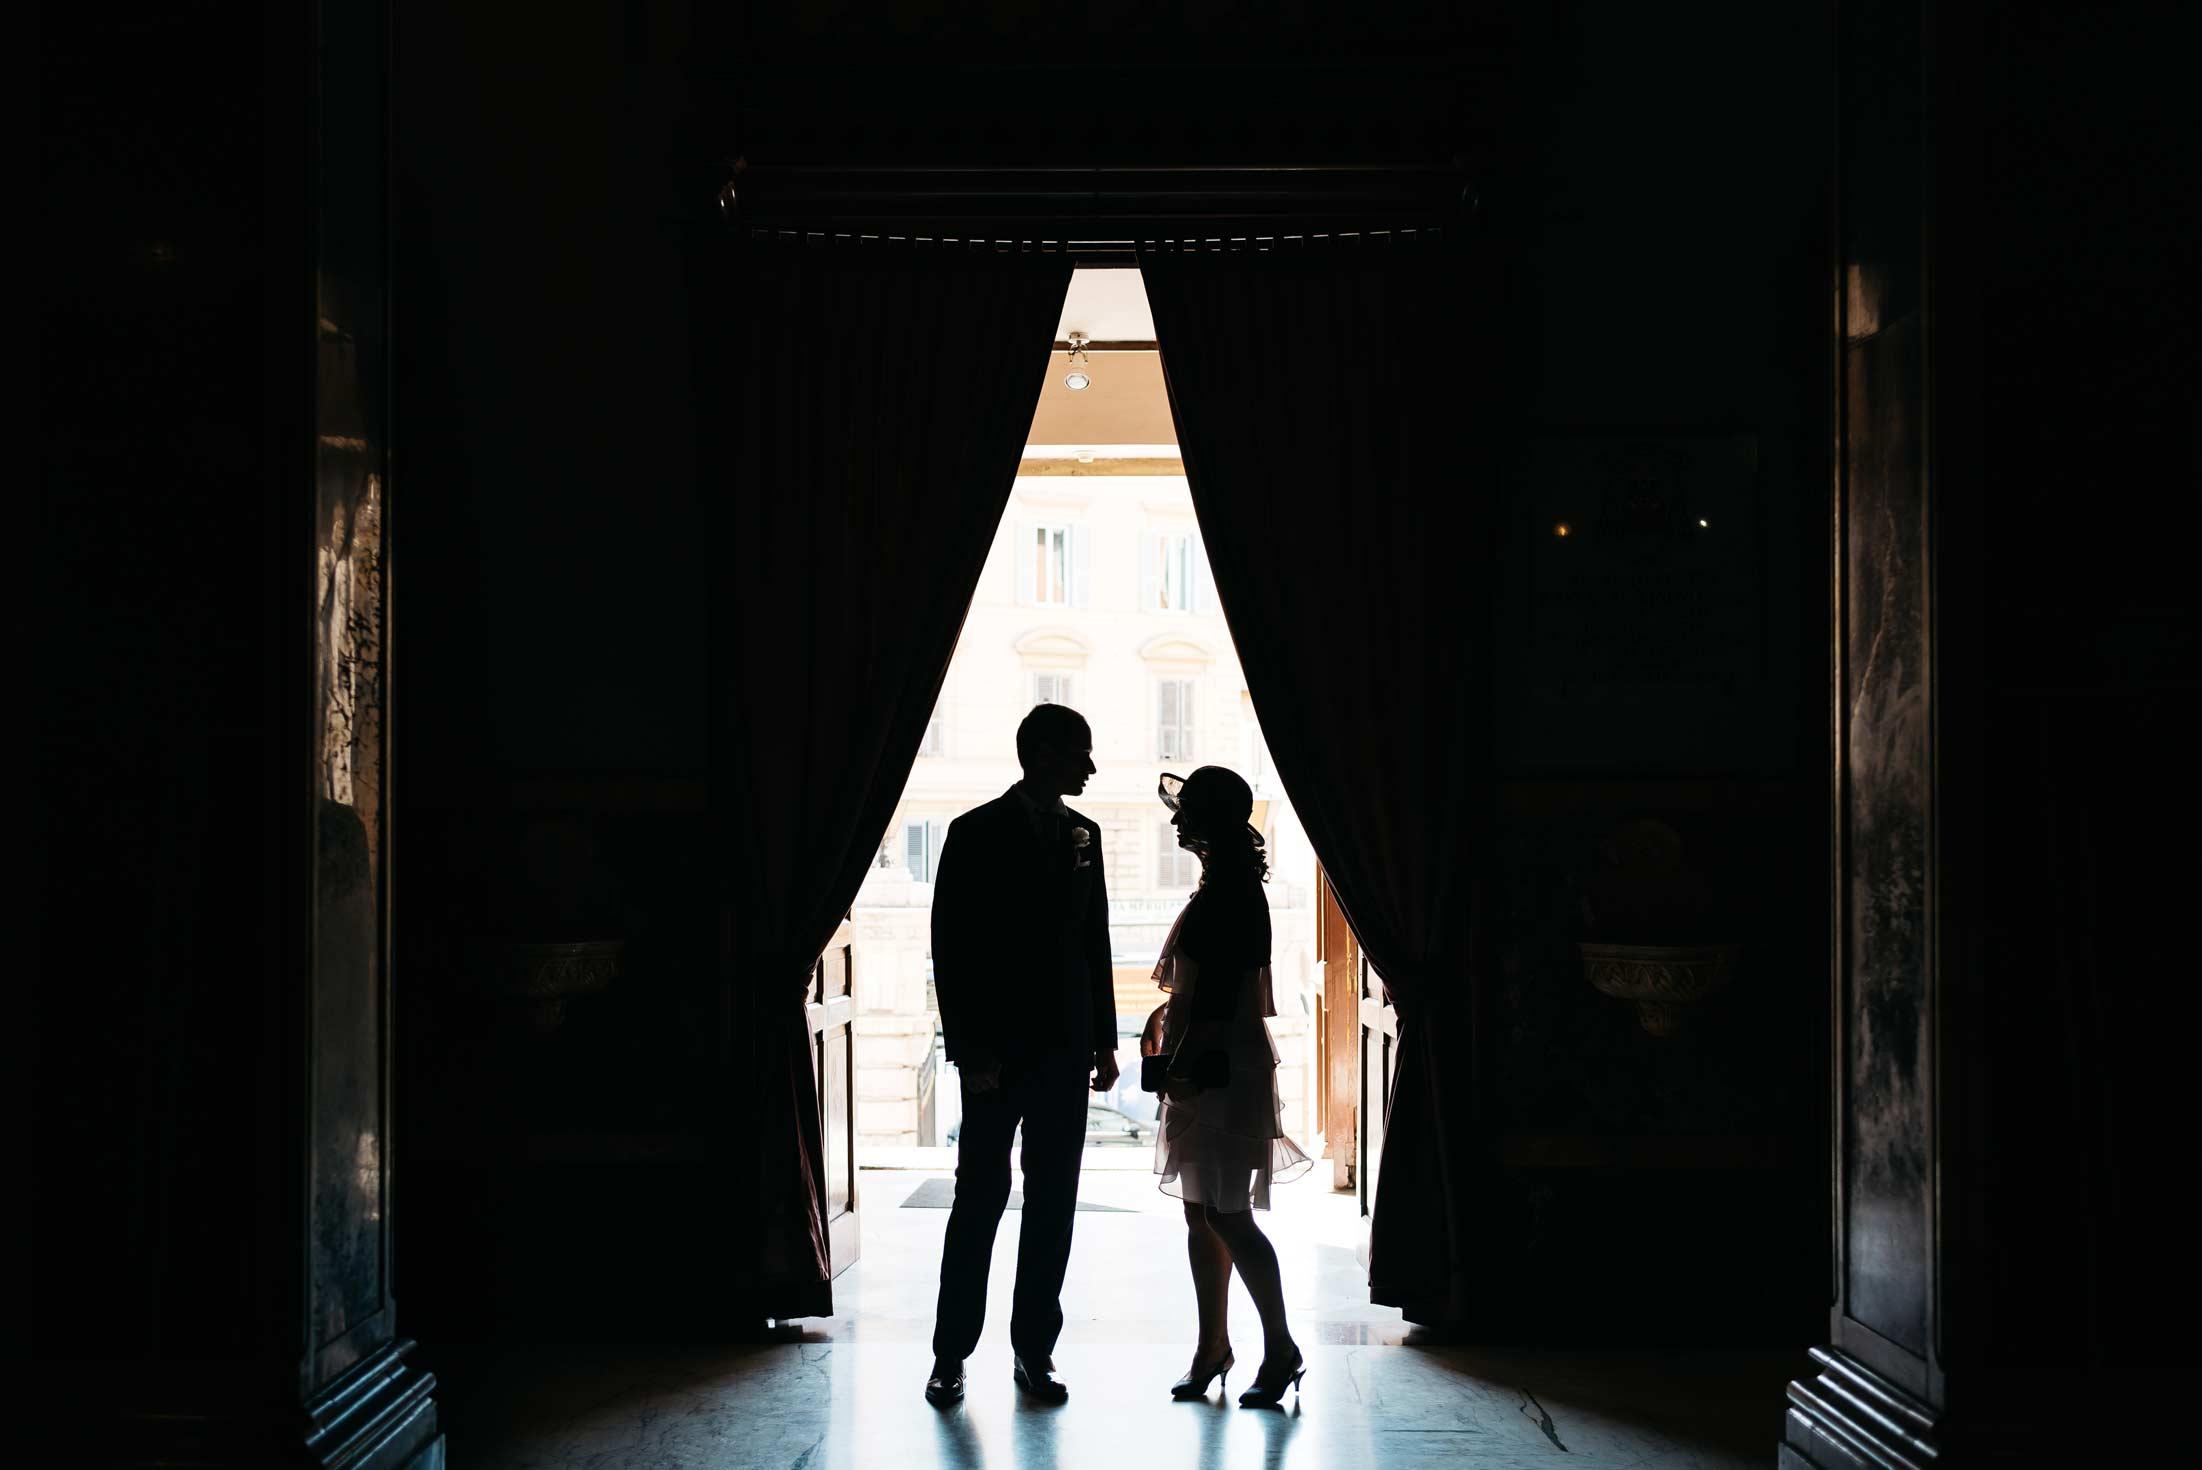 Reportage-Wedding-Photographer-in-Italy-Rome-1-Ceremony